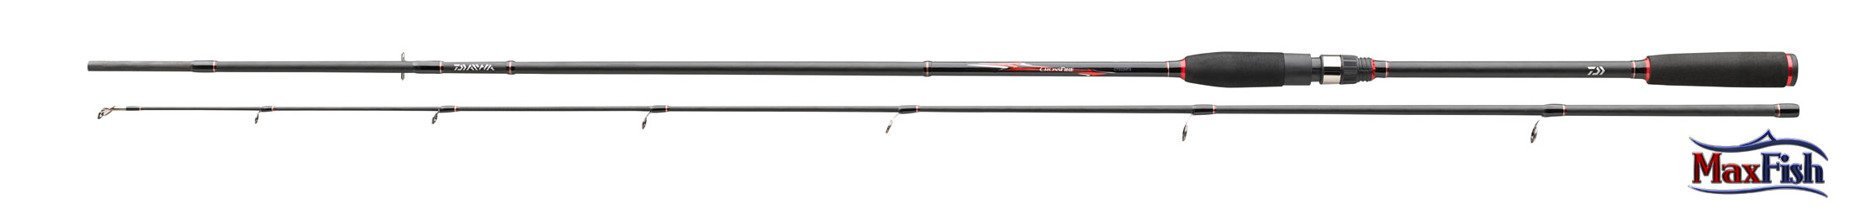 Daiwa Crossfire Jiggerspin  240cm 5-25g